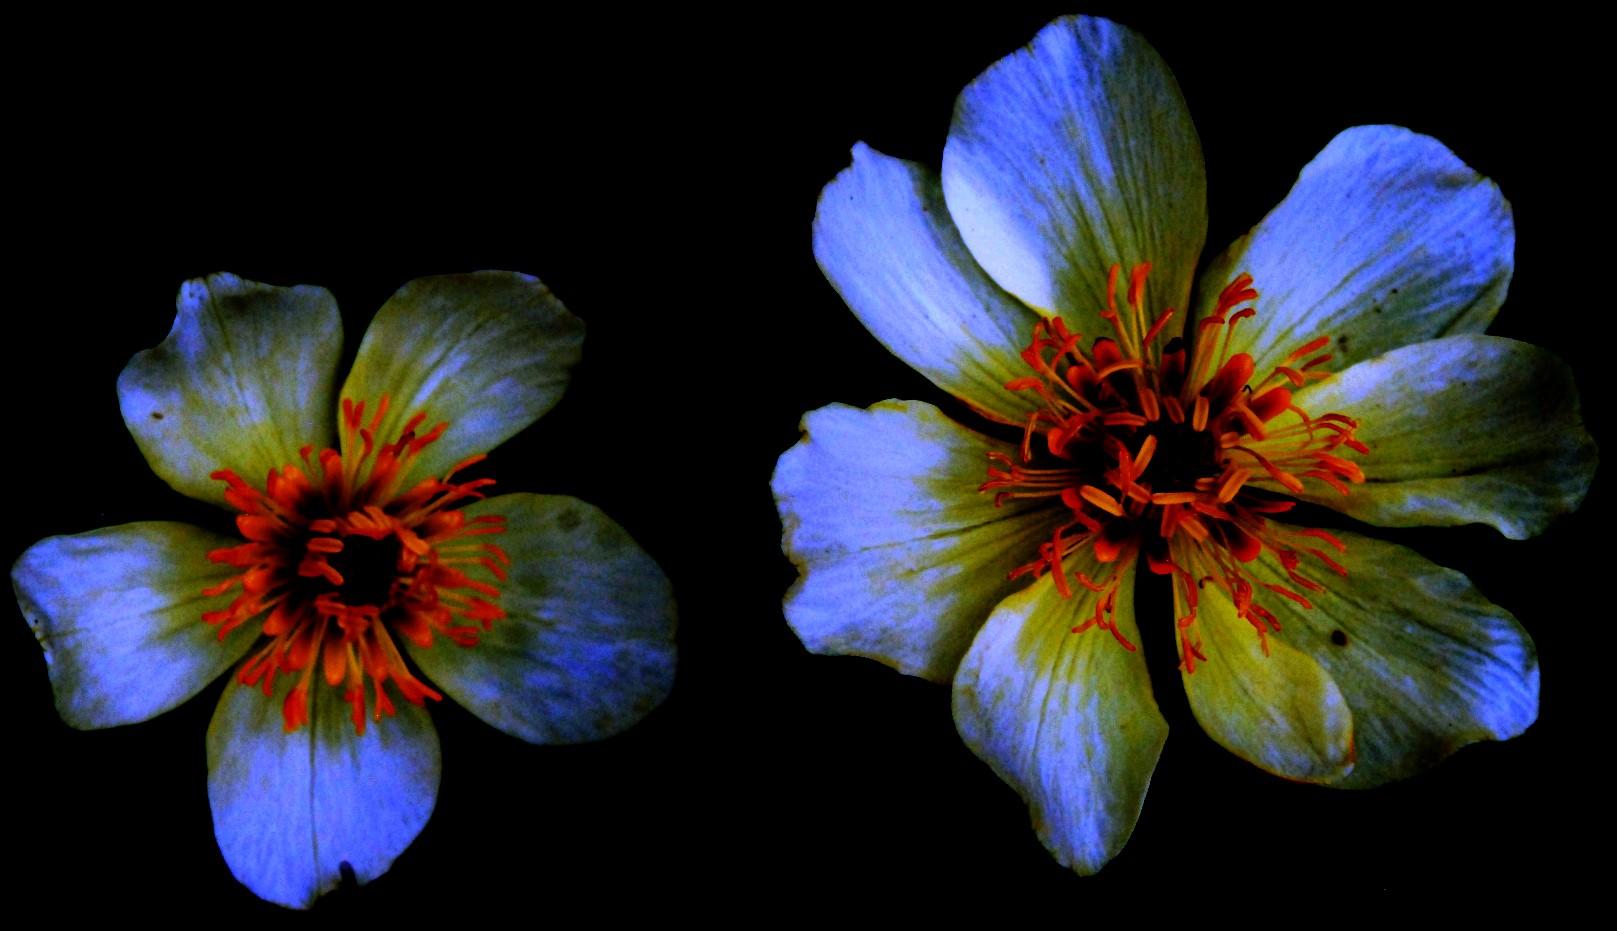 deconstructed+flowers.jpg